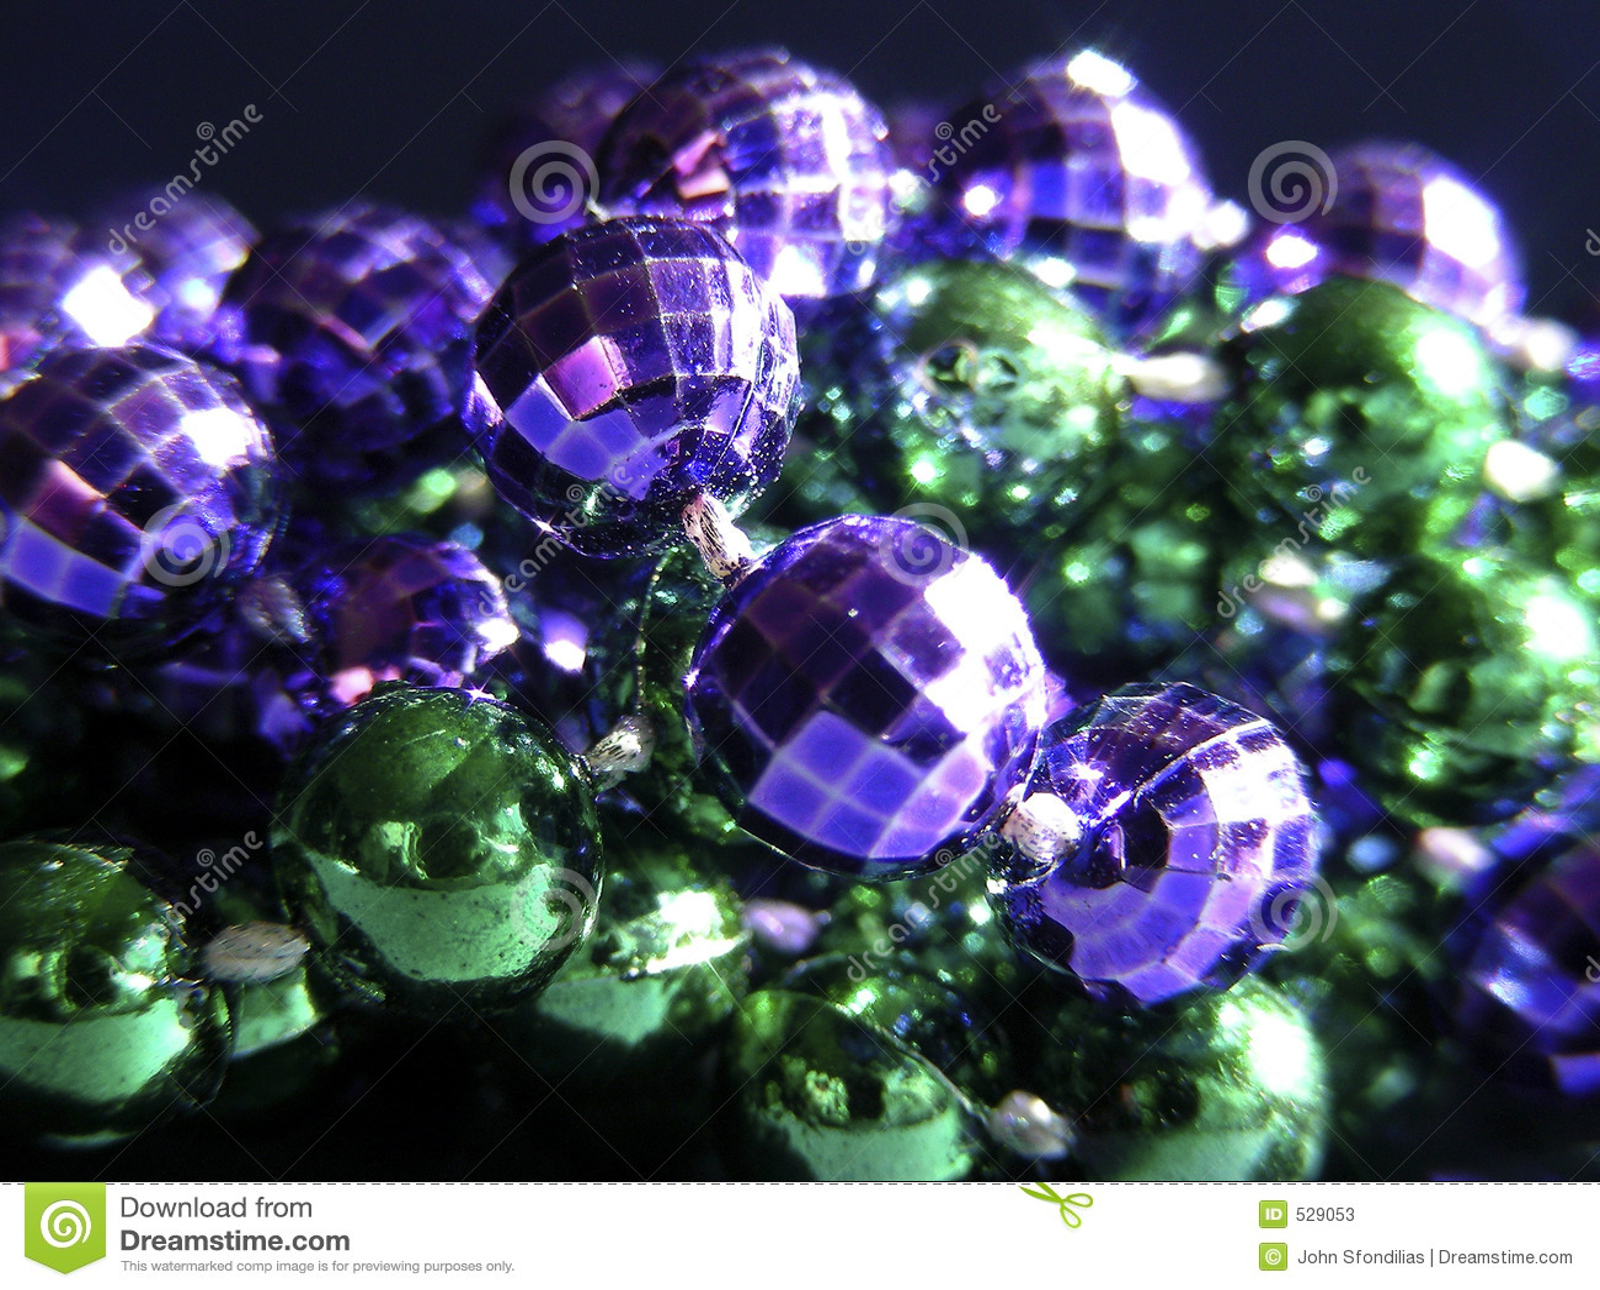 Download 成串珠状gras mardi 库存图片. 图片 包括有 紫色, mardi, 绿色, 奥尔良, 庆祝, 服装 - 529053